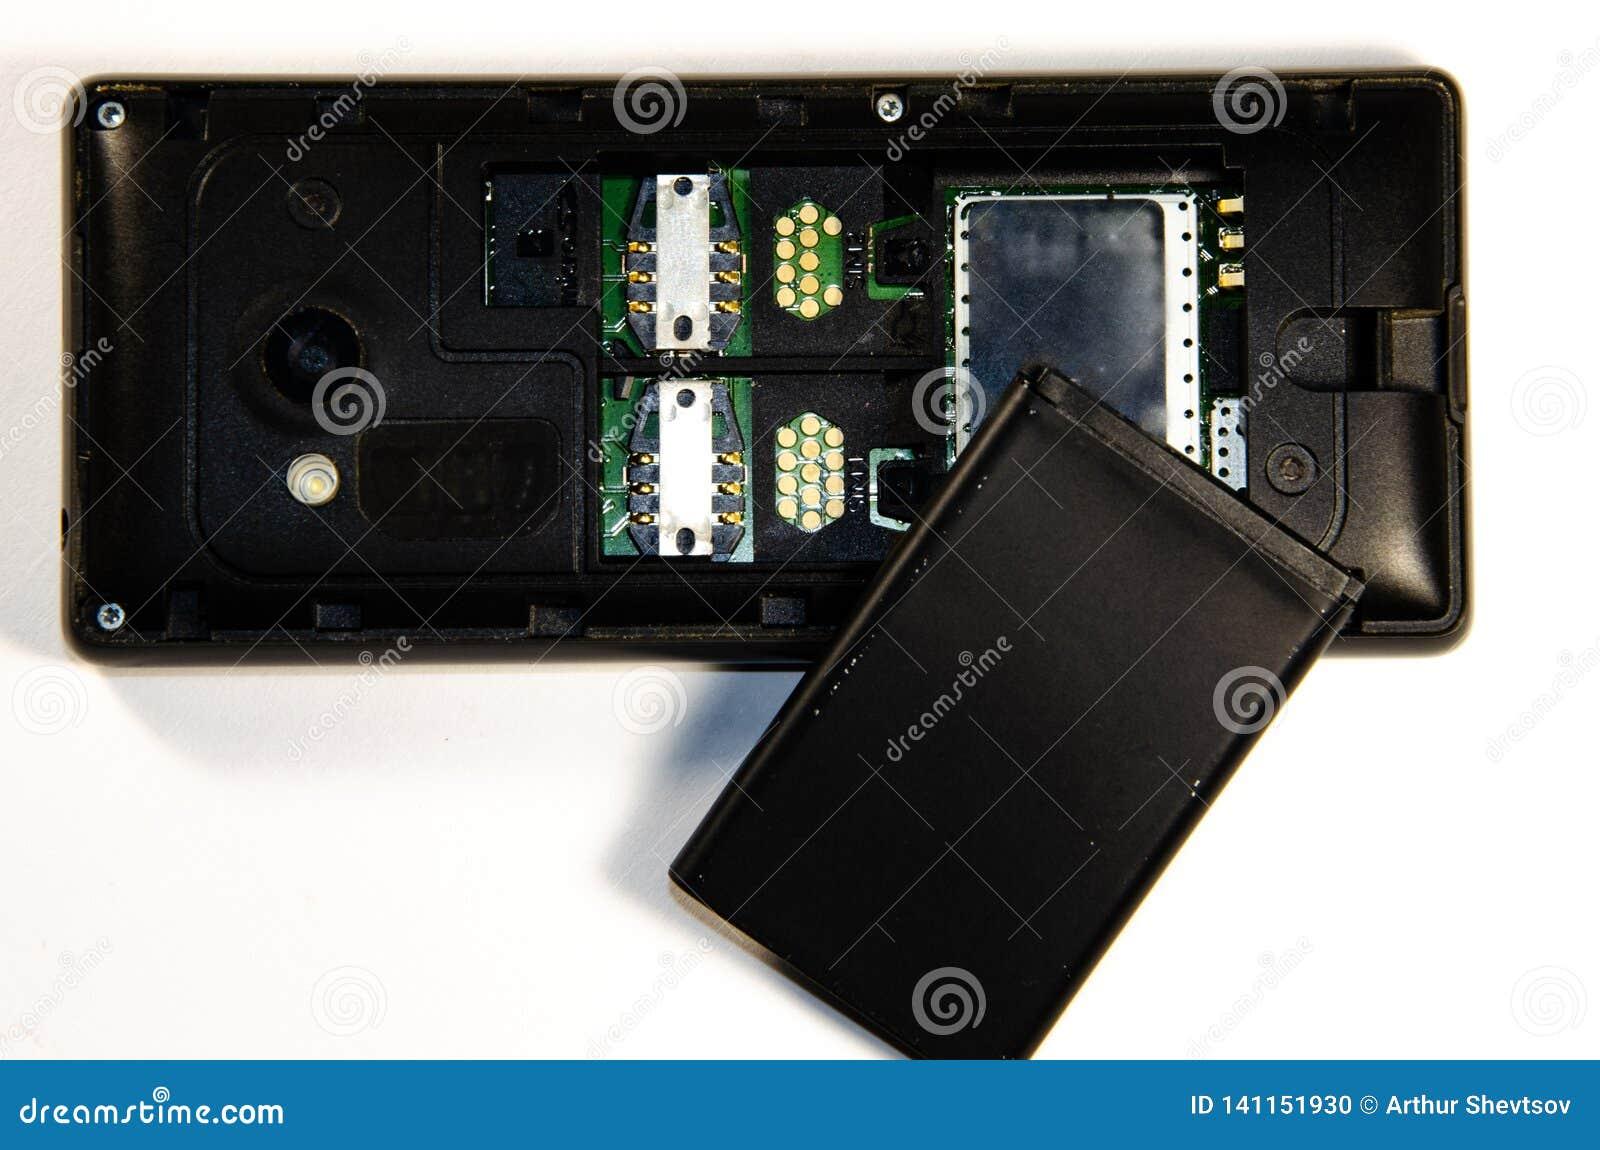 Push-button telephone, parsing, SIM card, memory card